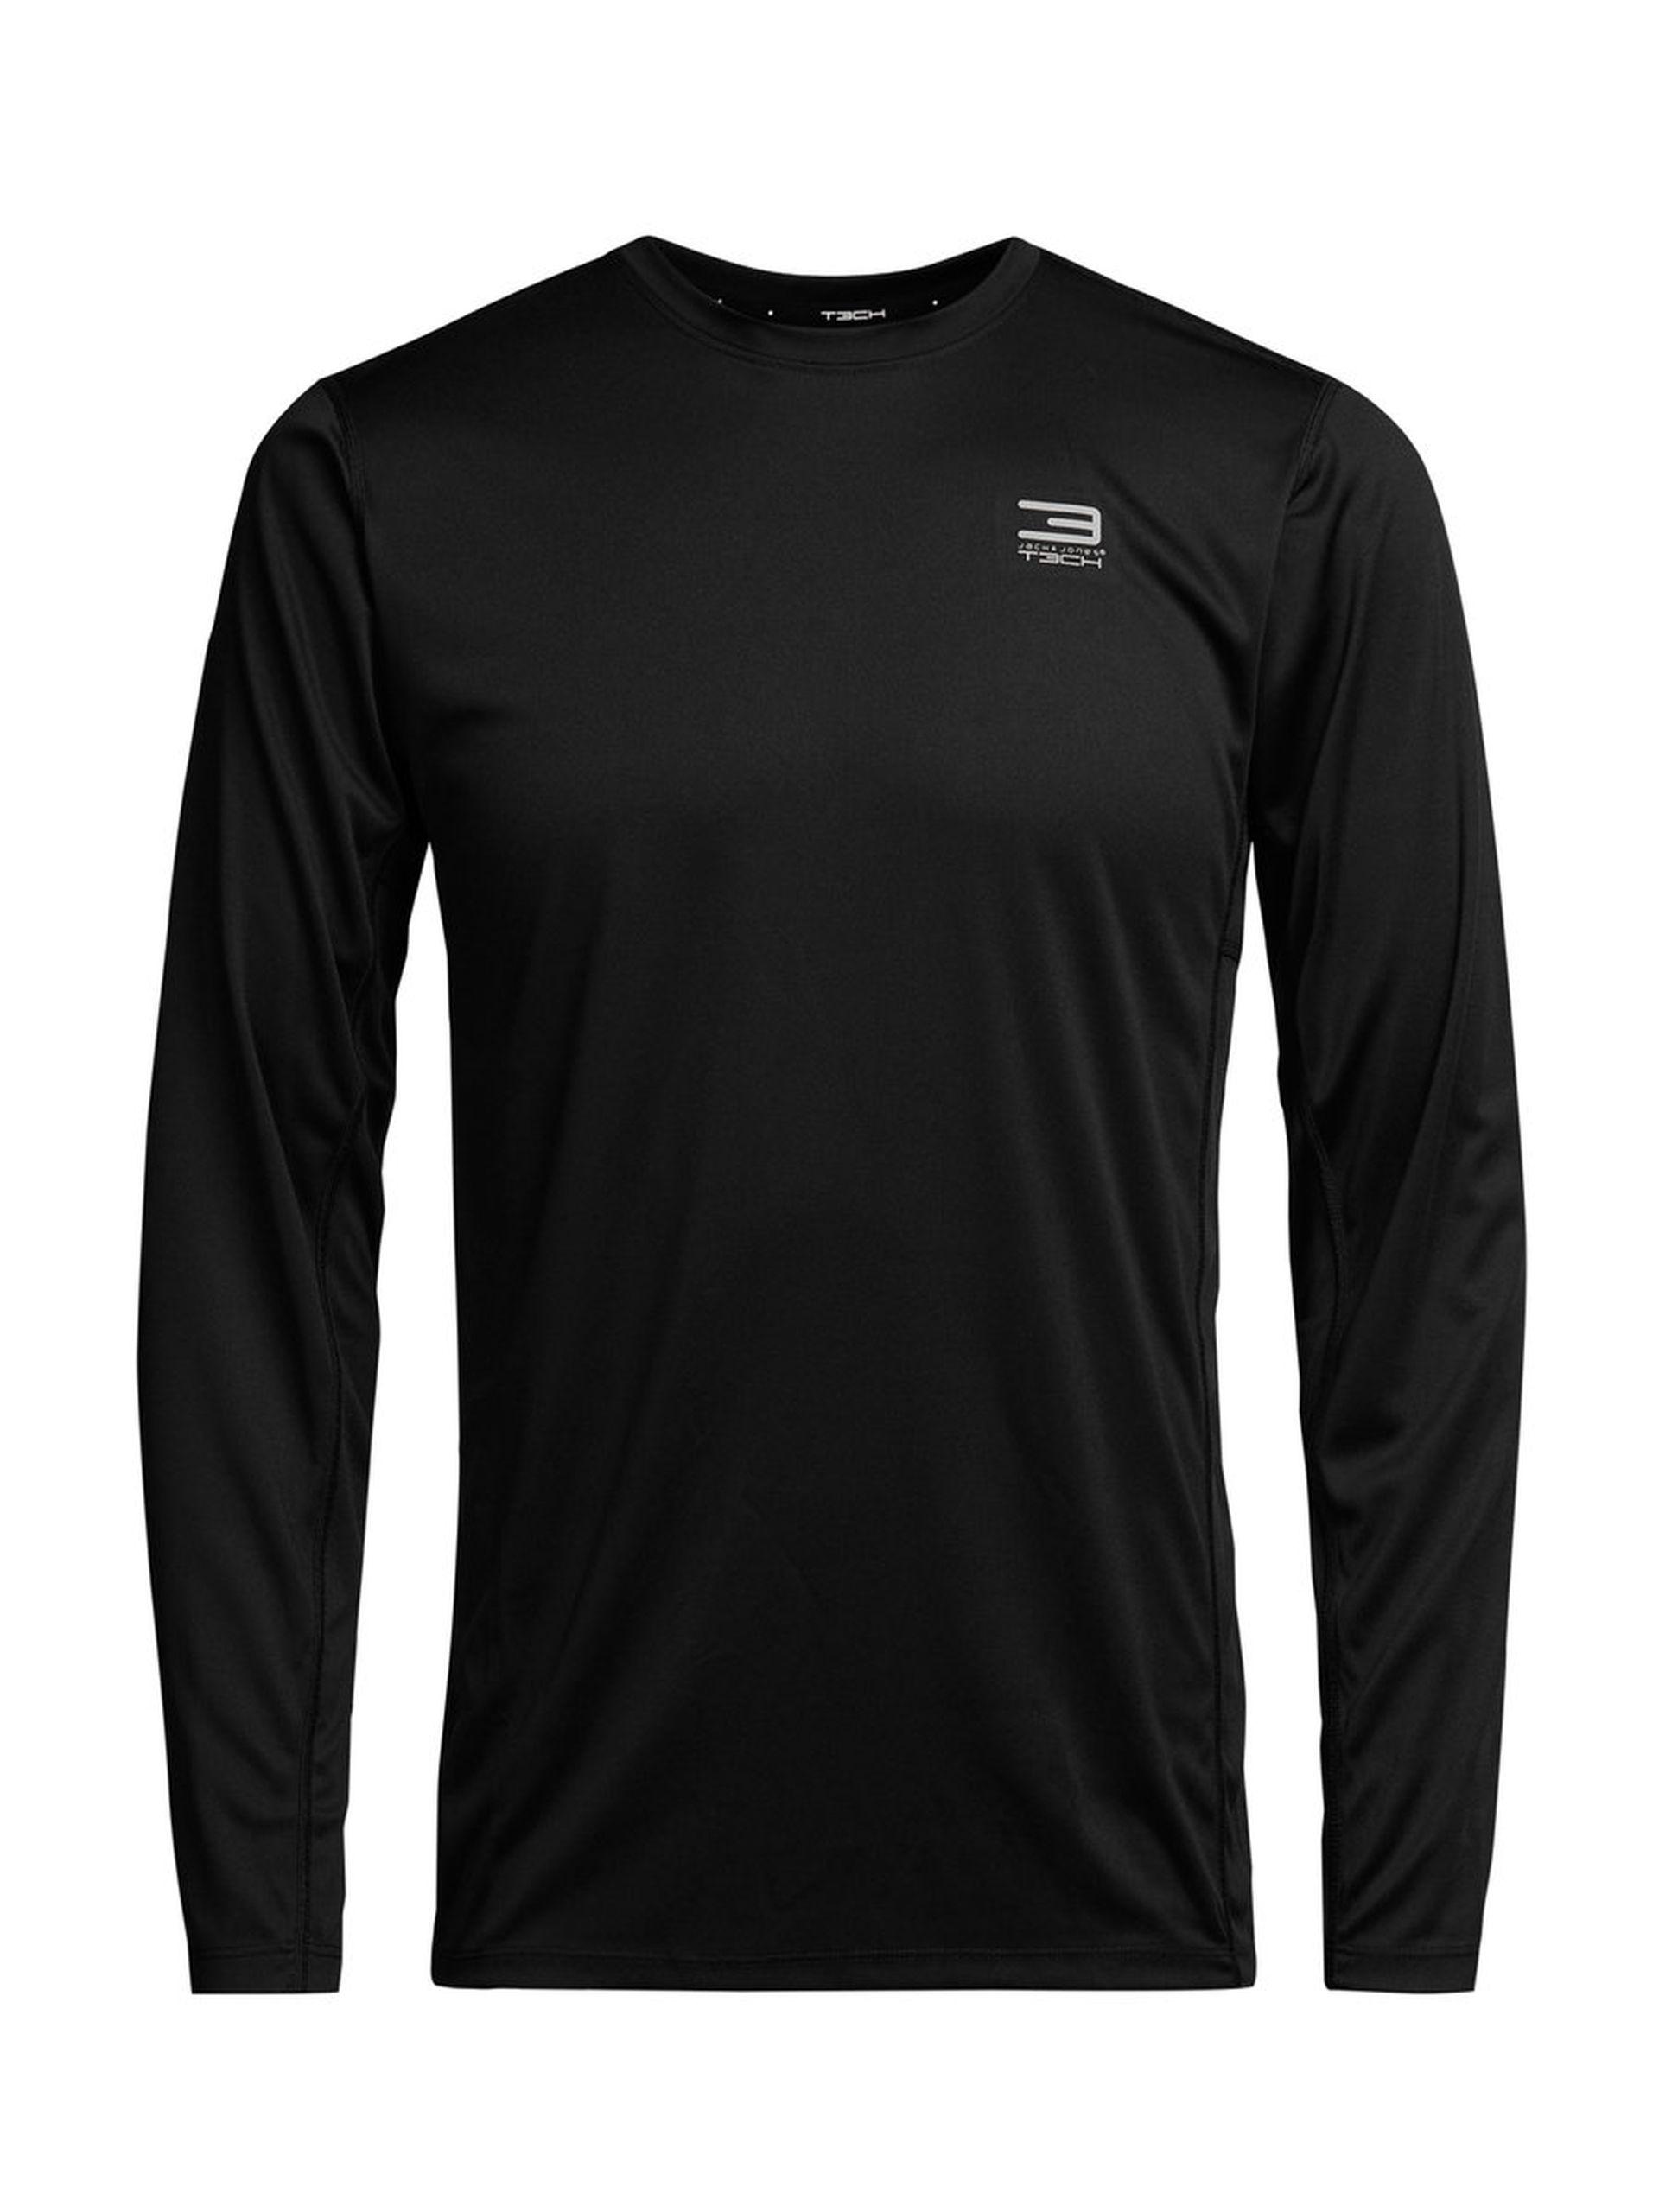 Training long-sleeved t-shirt, £15 ( jackjones.com )